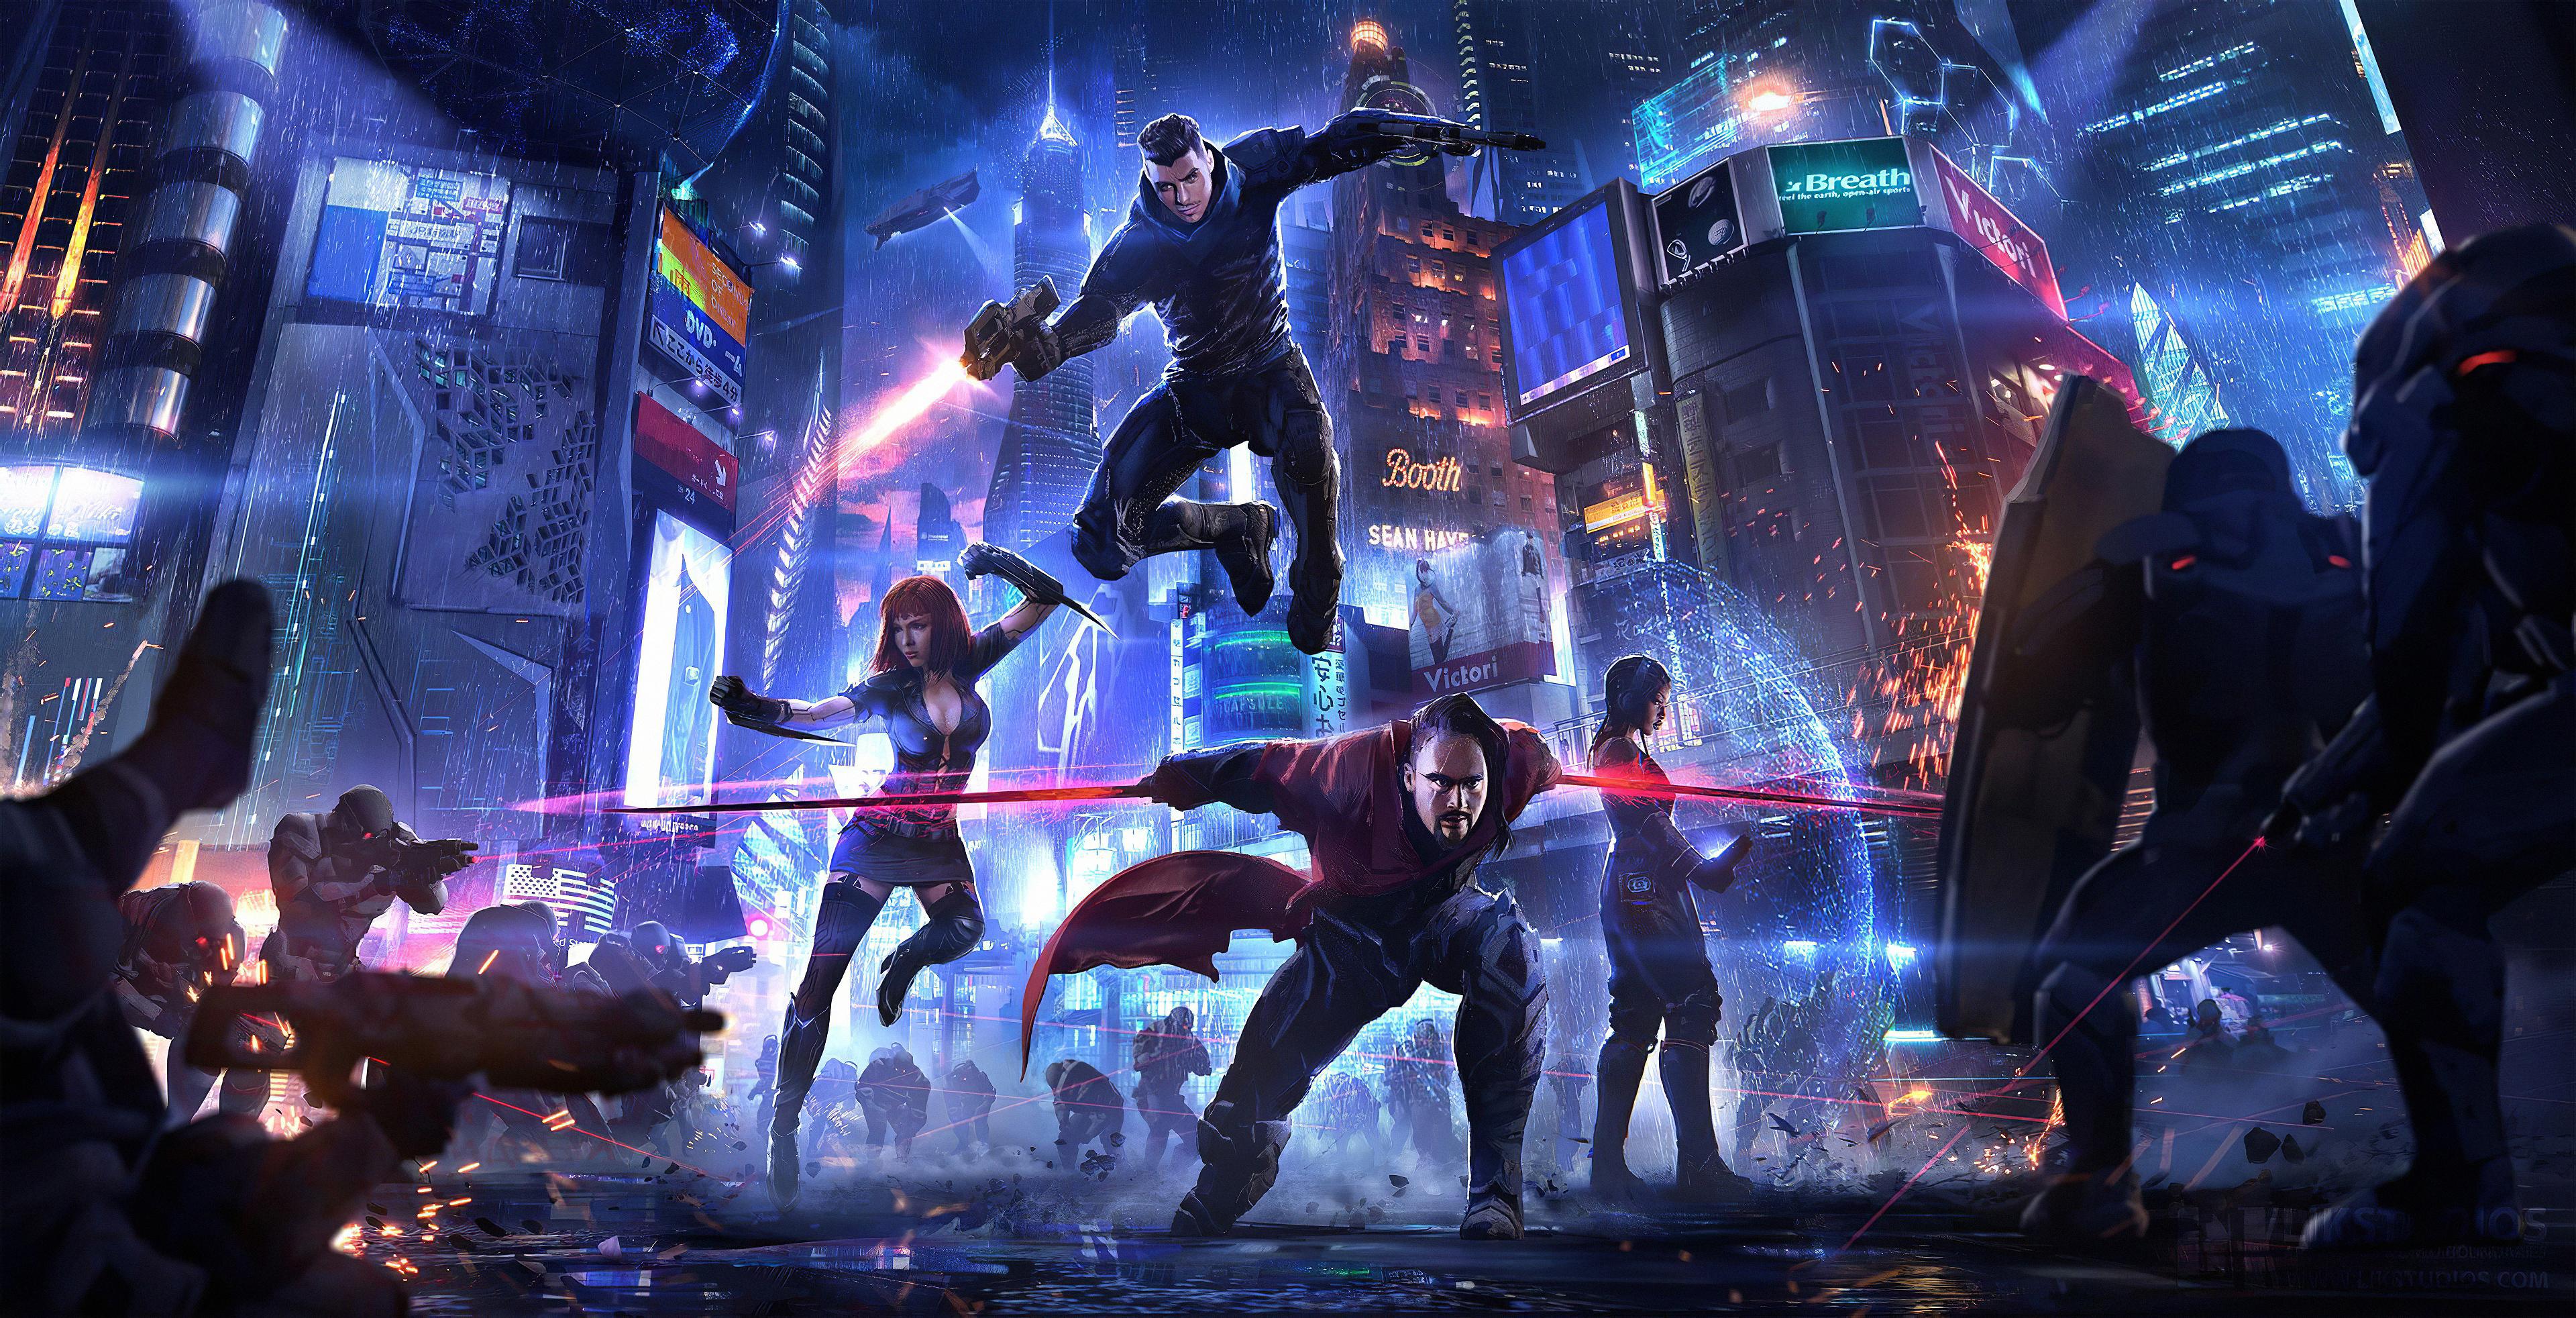 cyberpunk heroes 1578255466 - Cyberpunk Heroes -